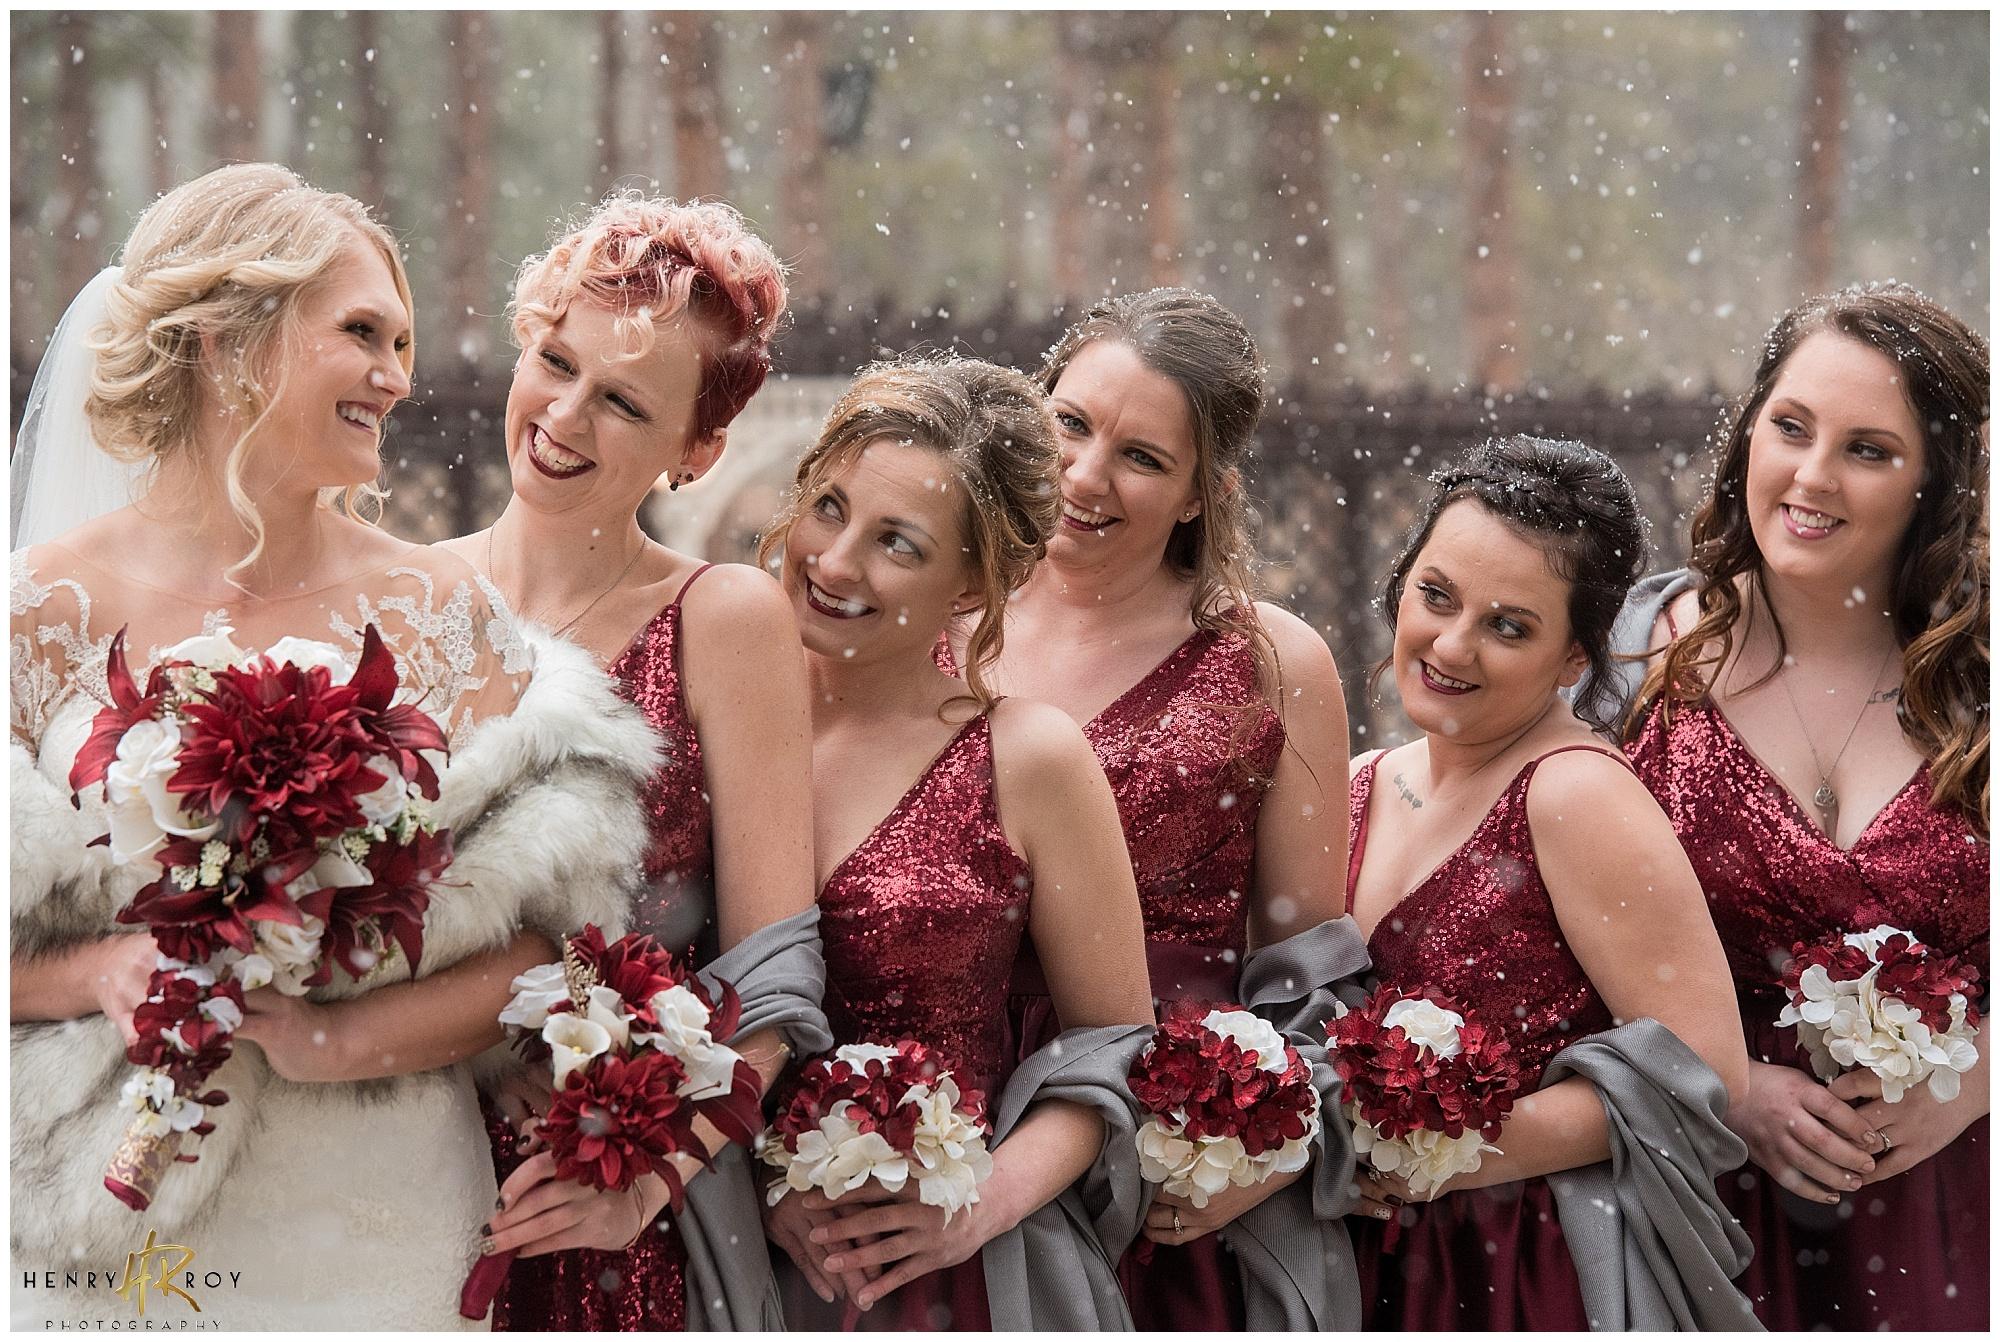 WEDDING PHOTOGRAPHER0021.jpg